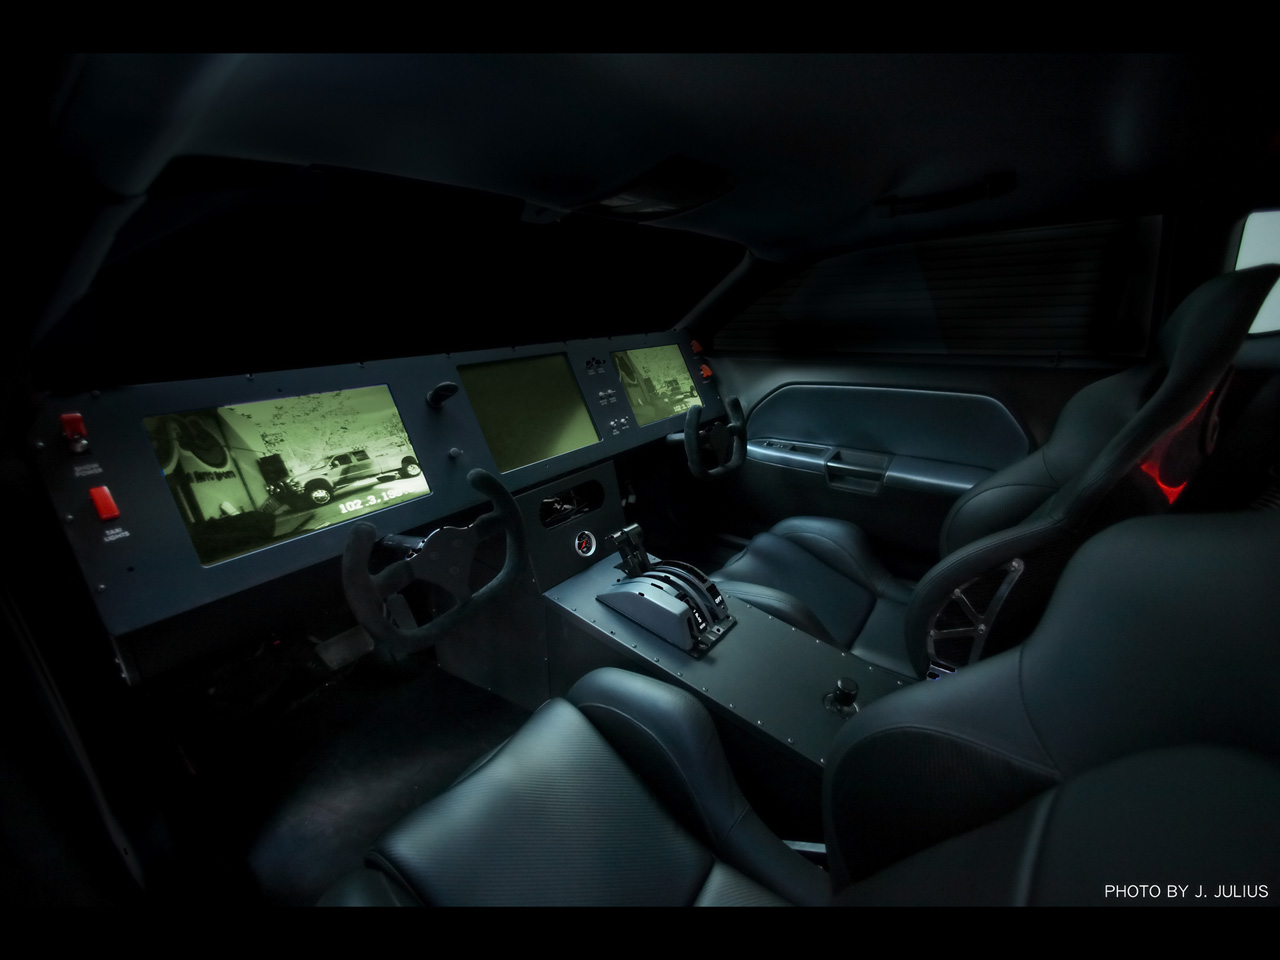 Vitara è tornata. Il SUV generazione 4.0 - Vitara Web Black Edition - image 001242-000011324 on https://motori.net